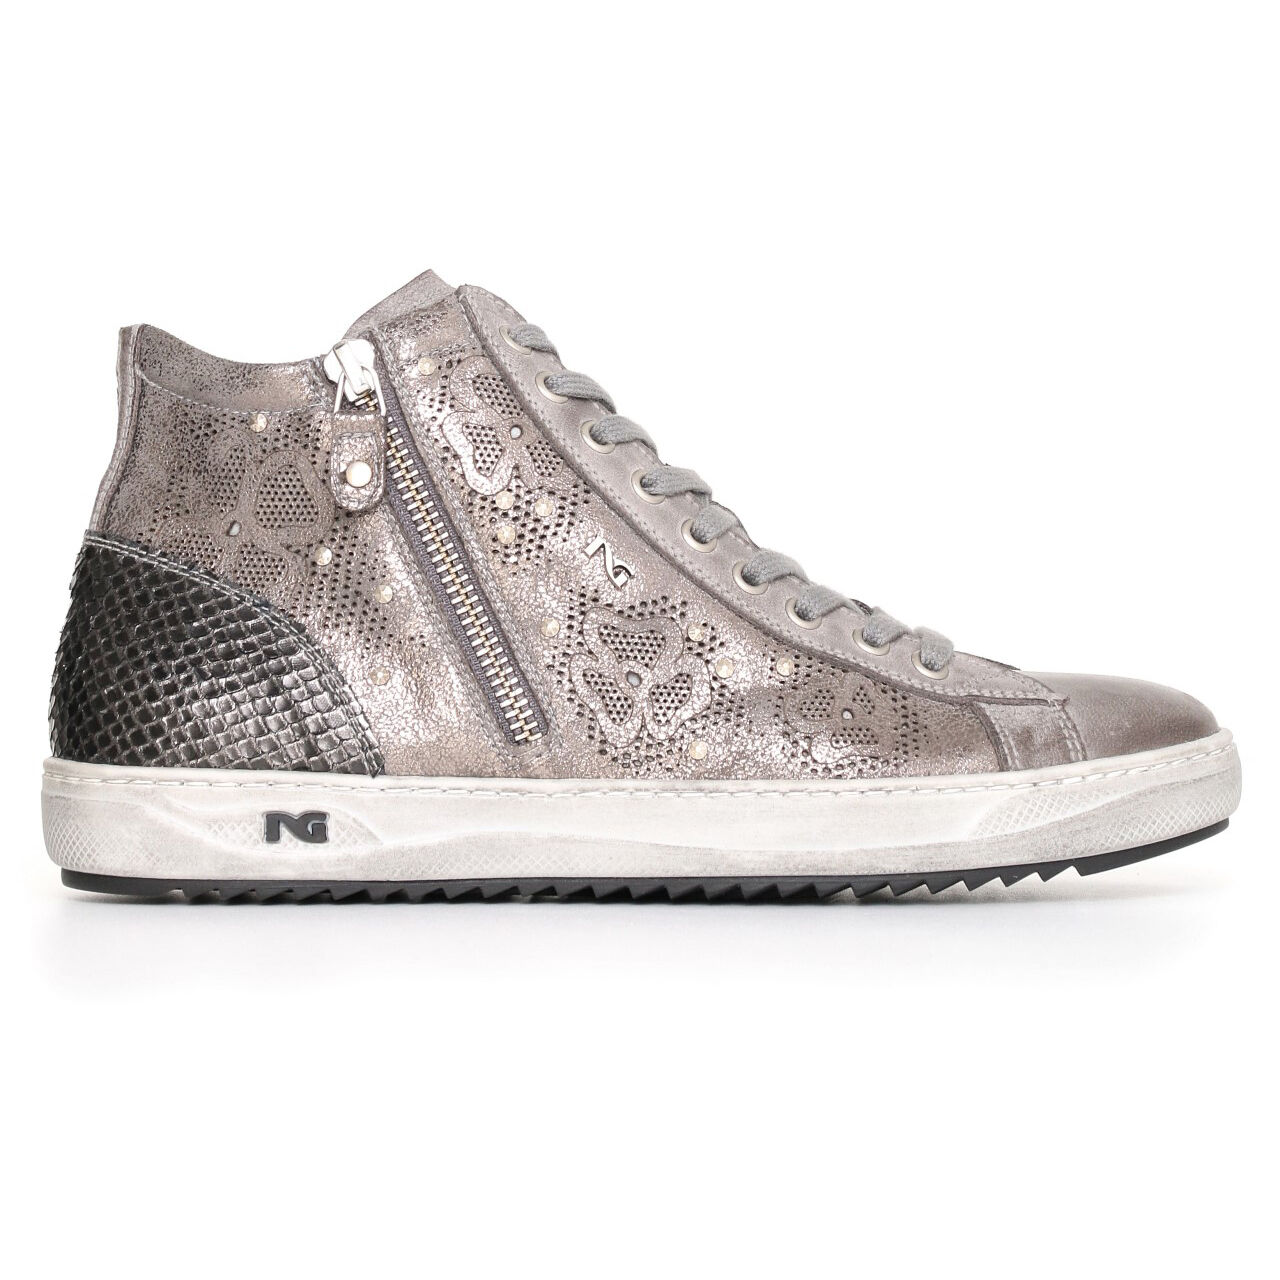 Sneaker scarpa sportiva Nerogiardini A719250D OFFERTA NUOVA COLLEZIONE 2017 zip OFFERTA A719250D b587d2